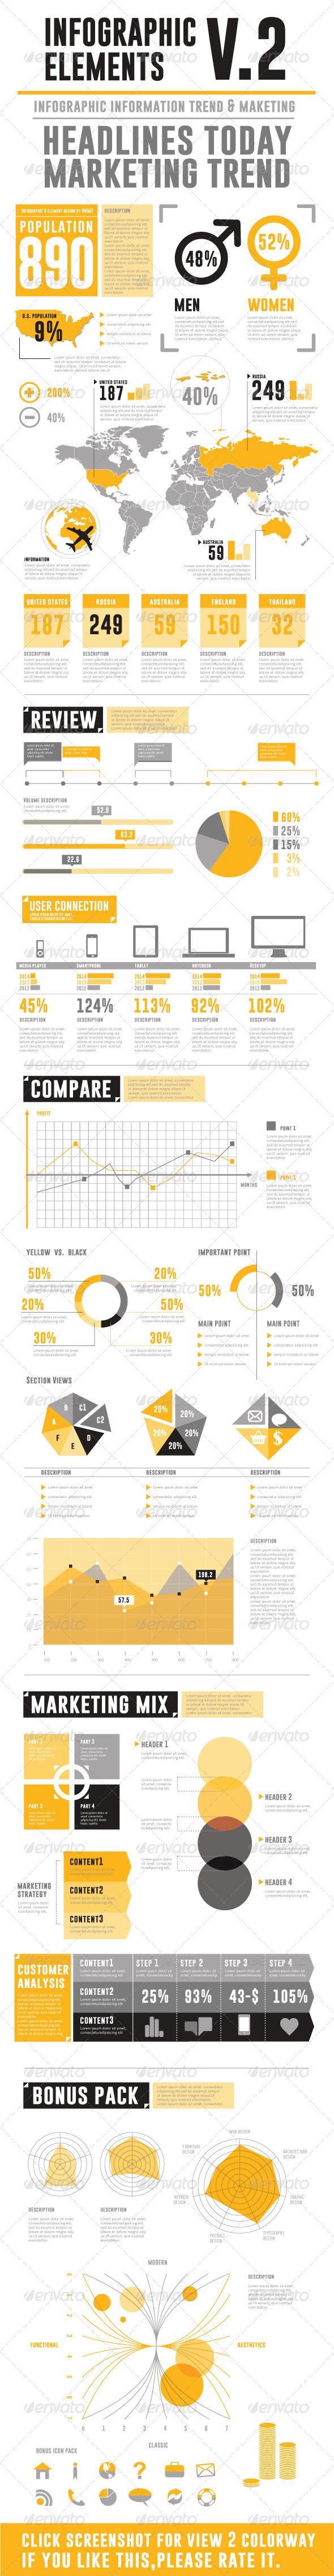 Infographic Elements V.2